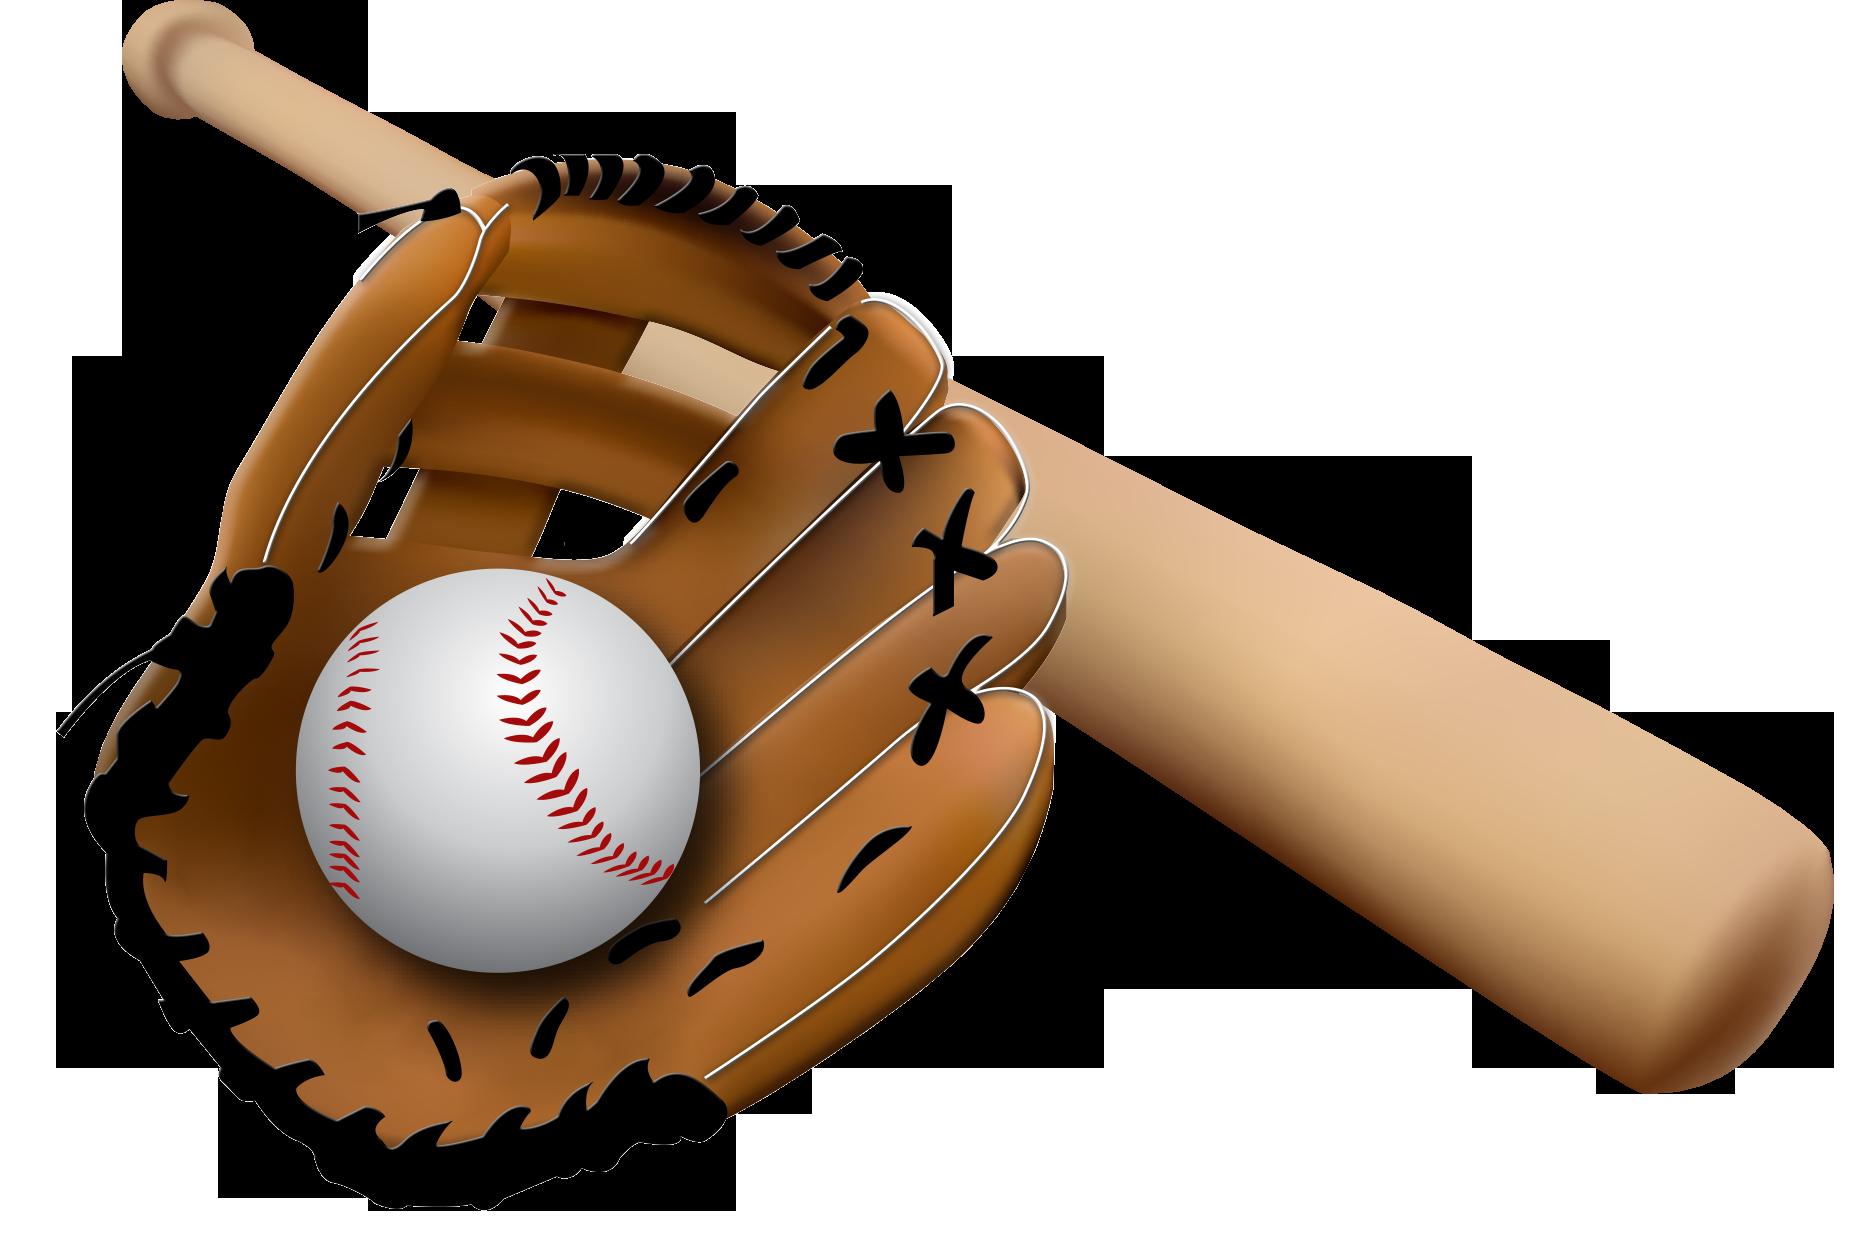 Painting Baseball Transparent Image Baseball Glove Kids Baseball Gloves Baseball Equipment